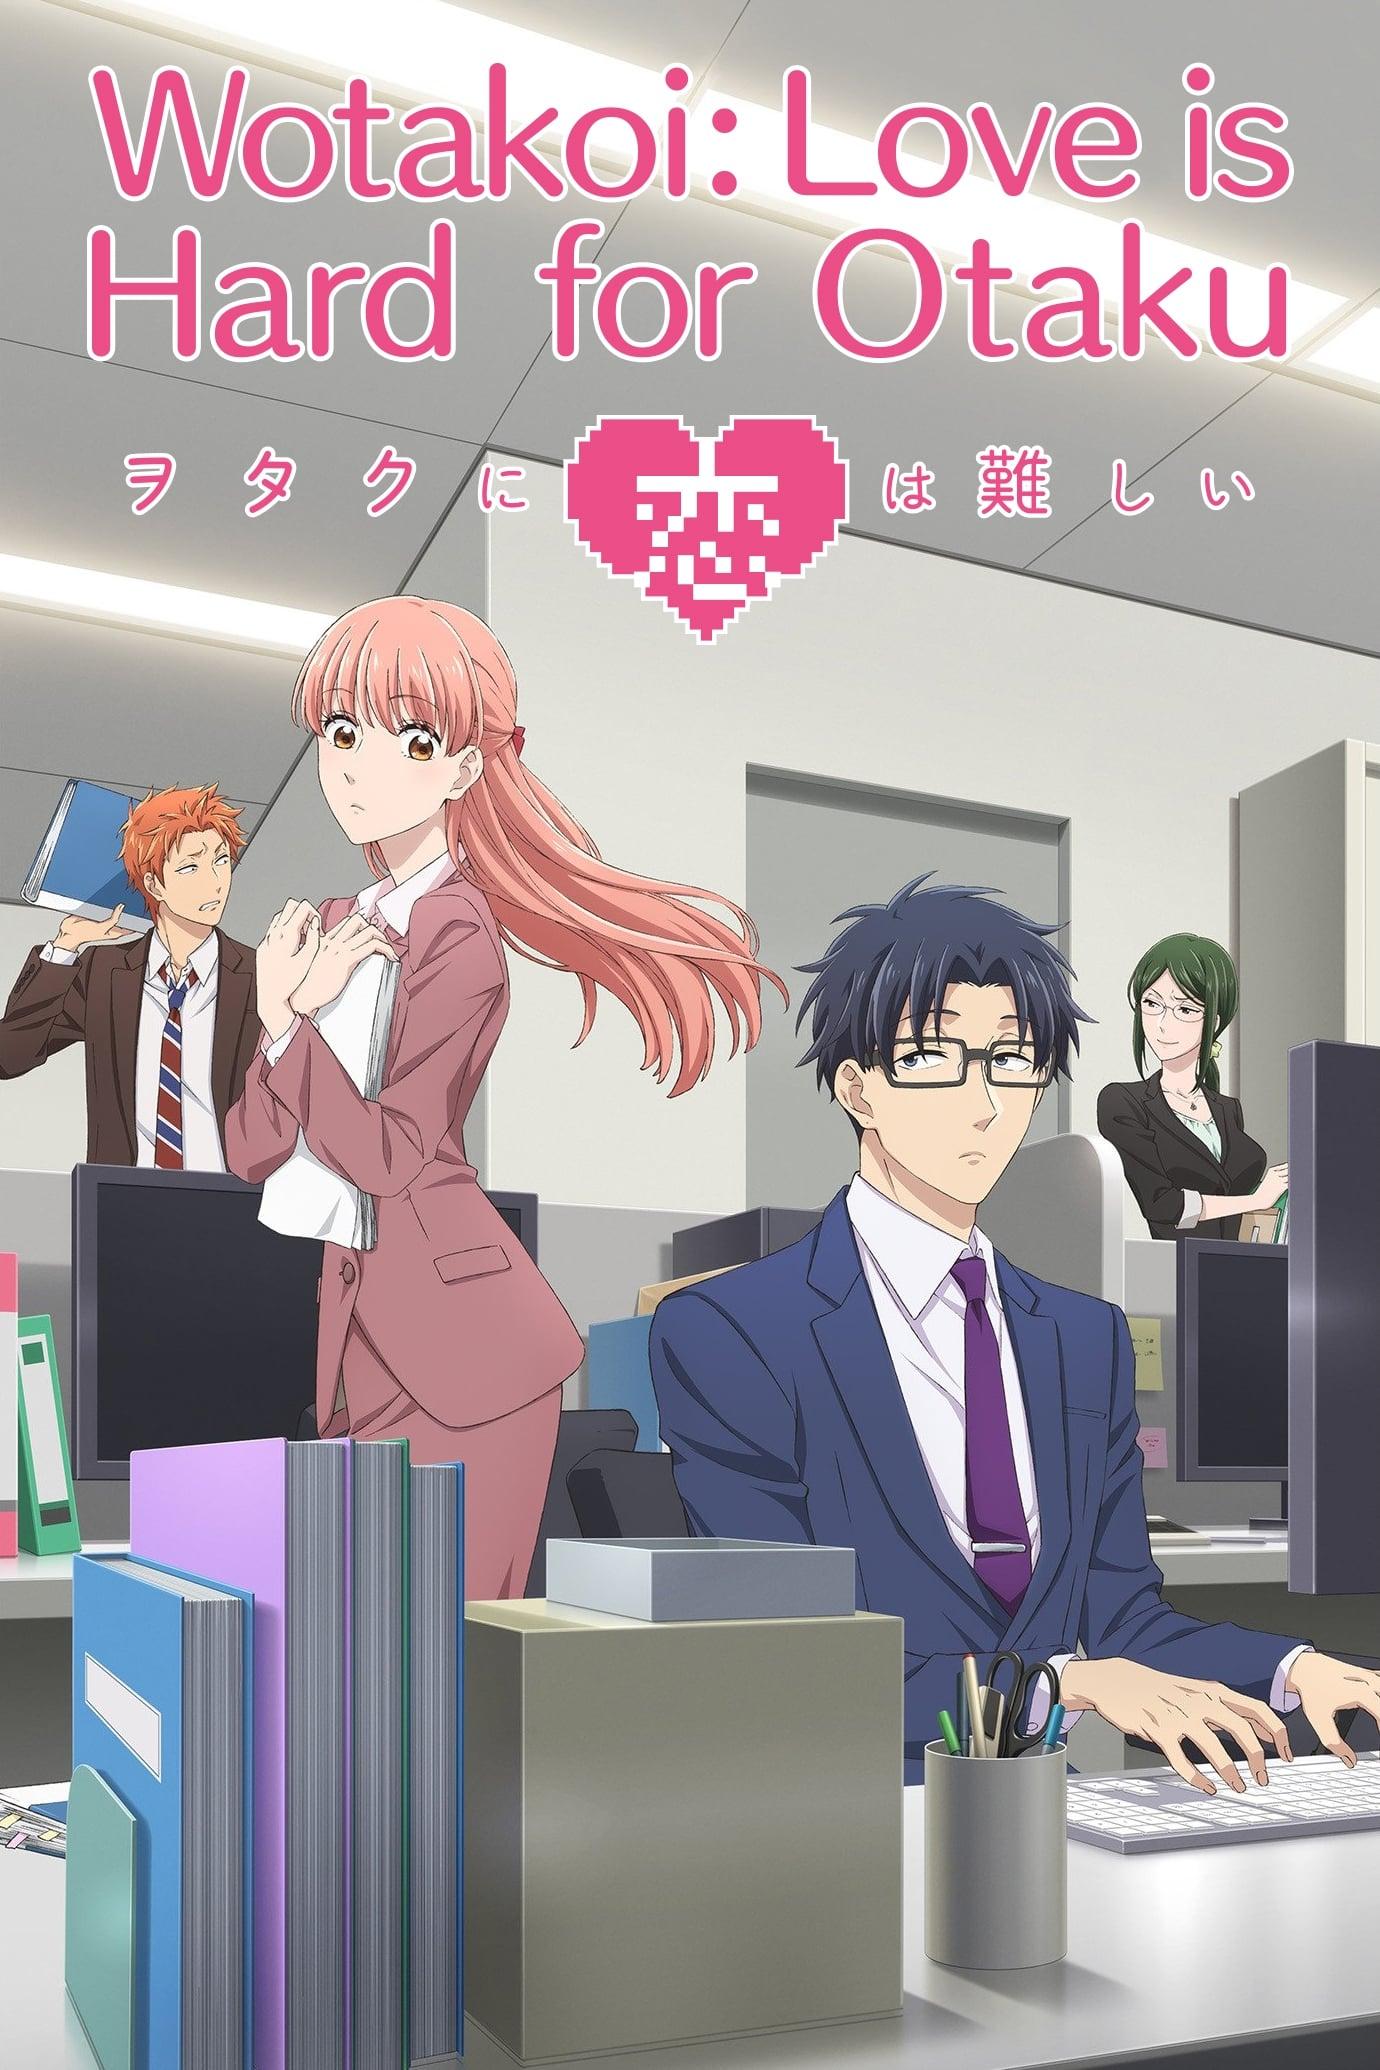 image for Wotakoi: Love is Hard for Otaku